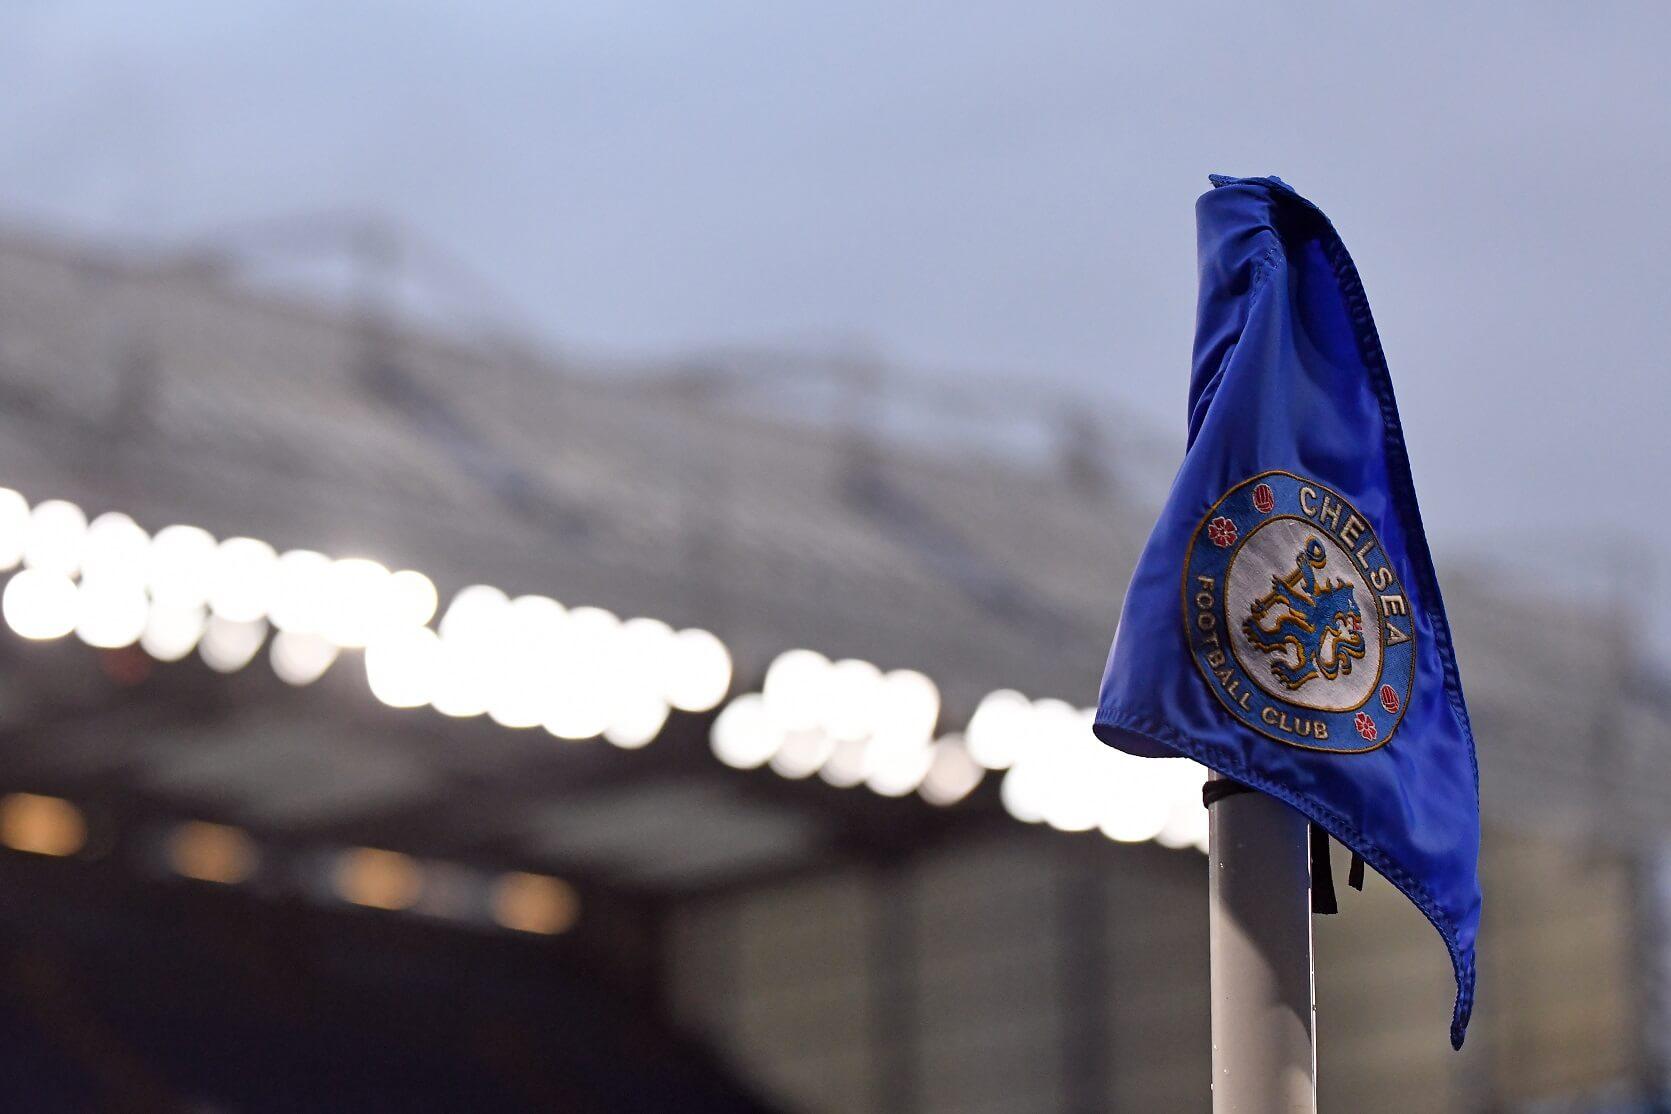 Chelsea FC corner